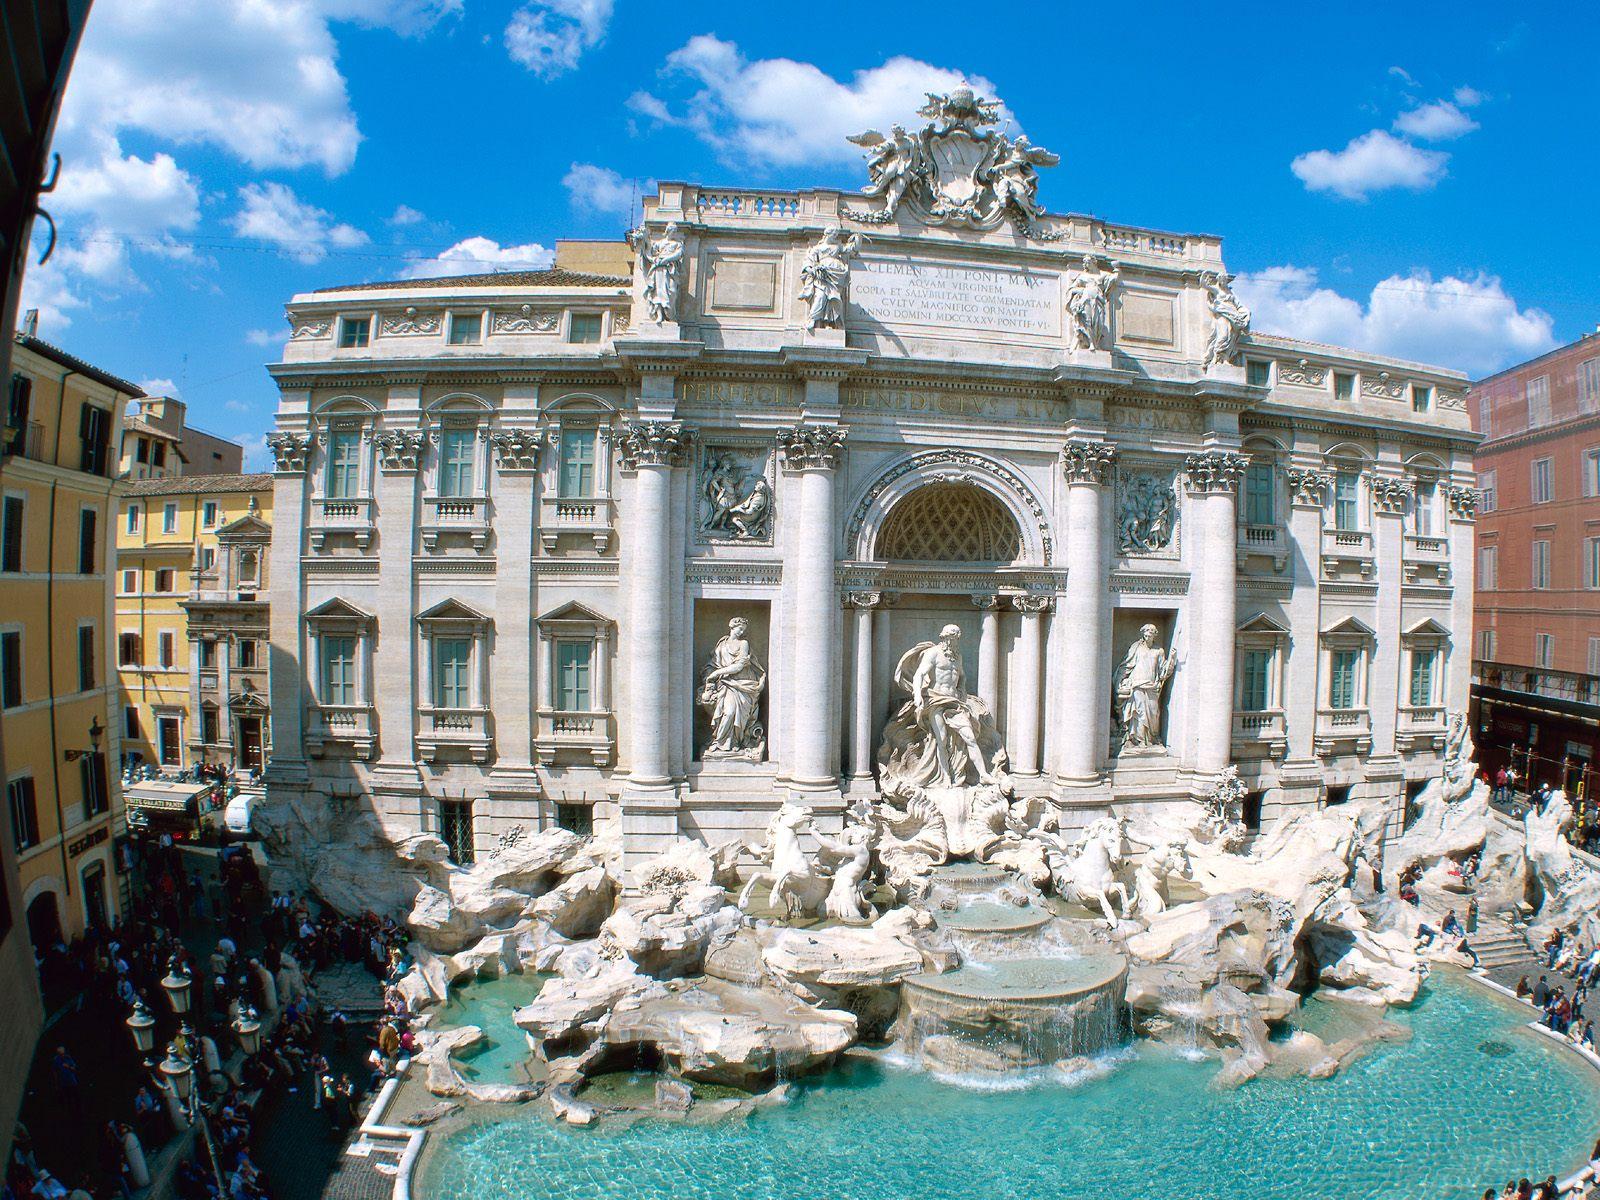 http://1.bp.blogspot.com/-pi-QmuPMzXs/Td_uHFSTTJI/AAAAAAAAEMc/jje4v5ThQHs/s1600/trevi_fountain_rome_italy-normal.jpg